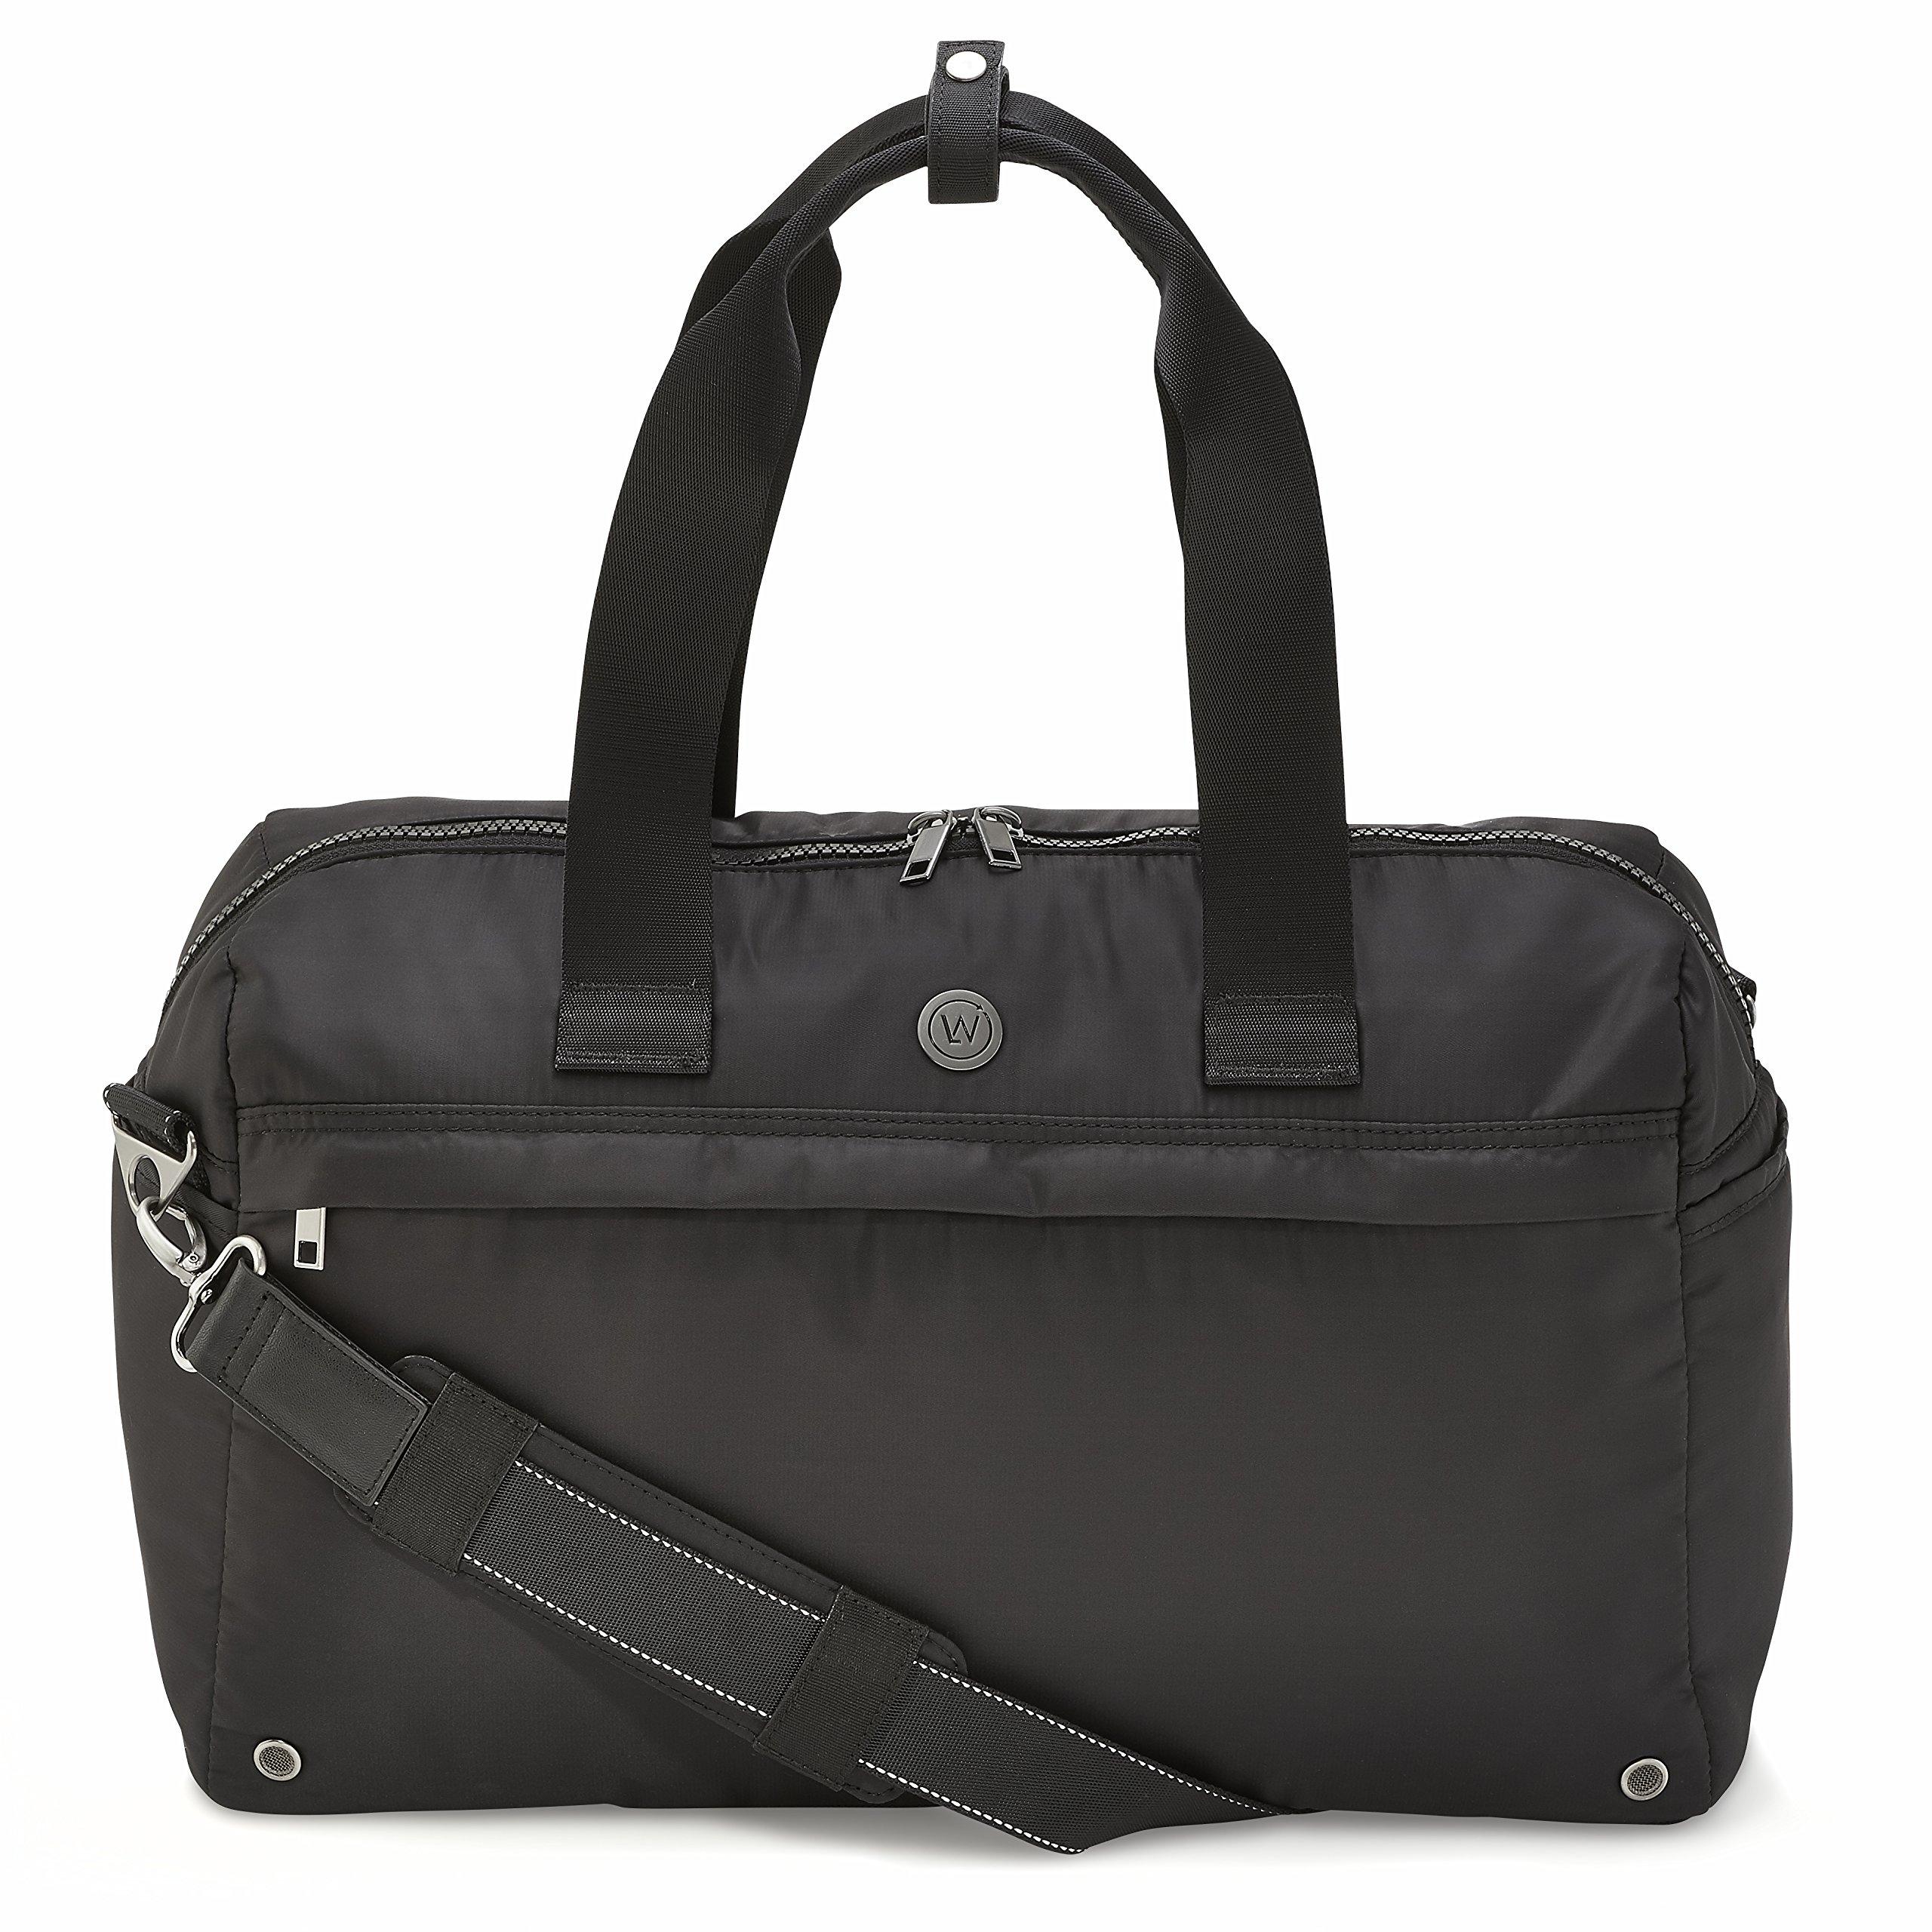 LIVE WELL 360 Core Fitness Bag (Onyx Black)